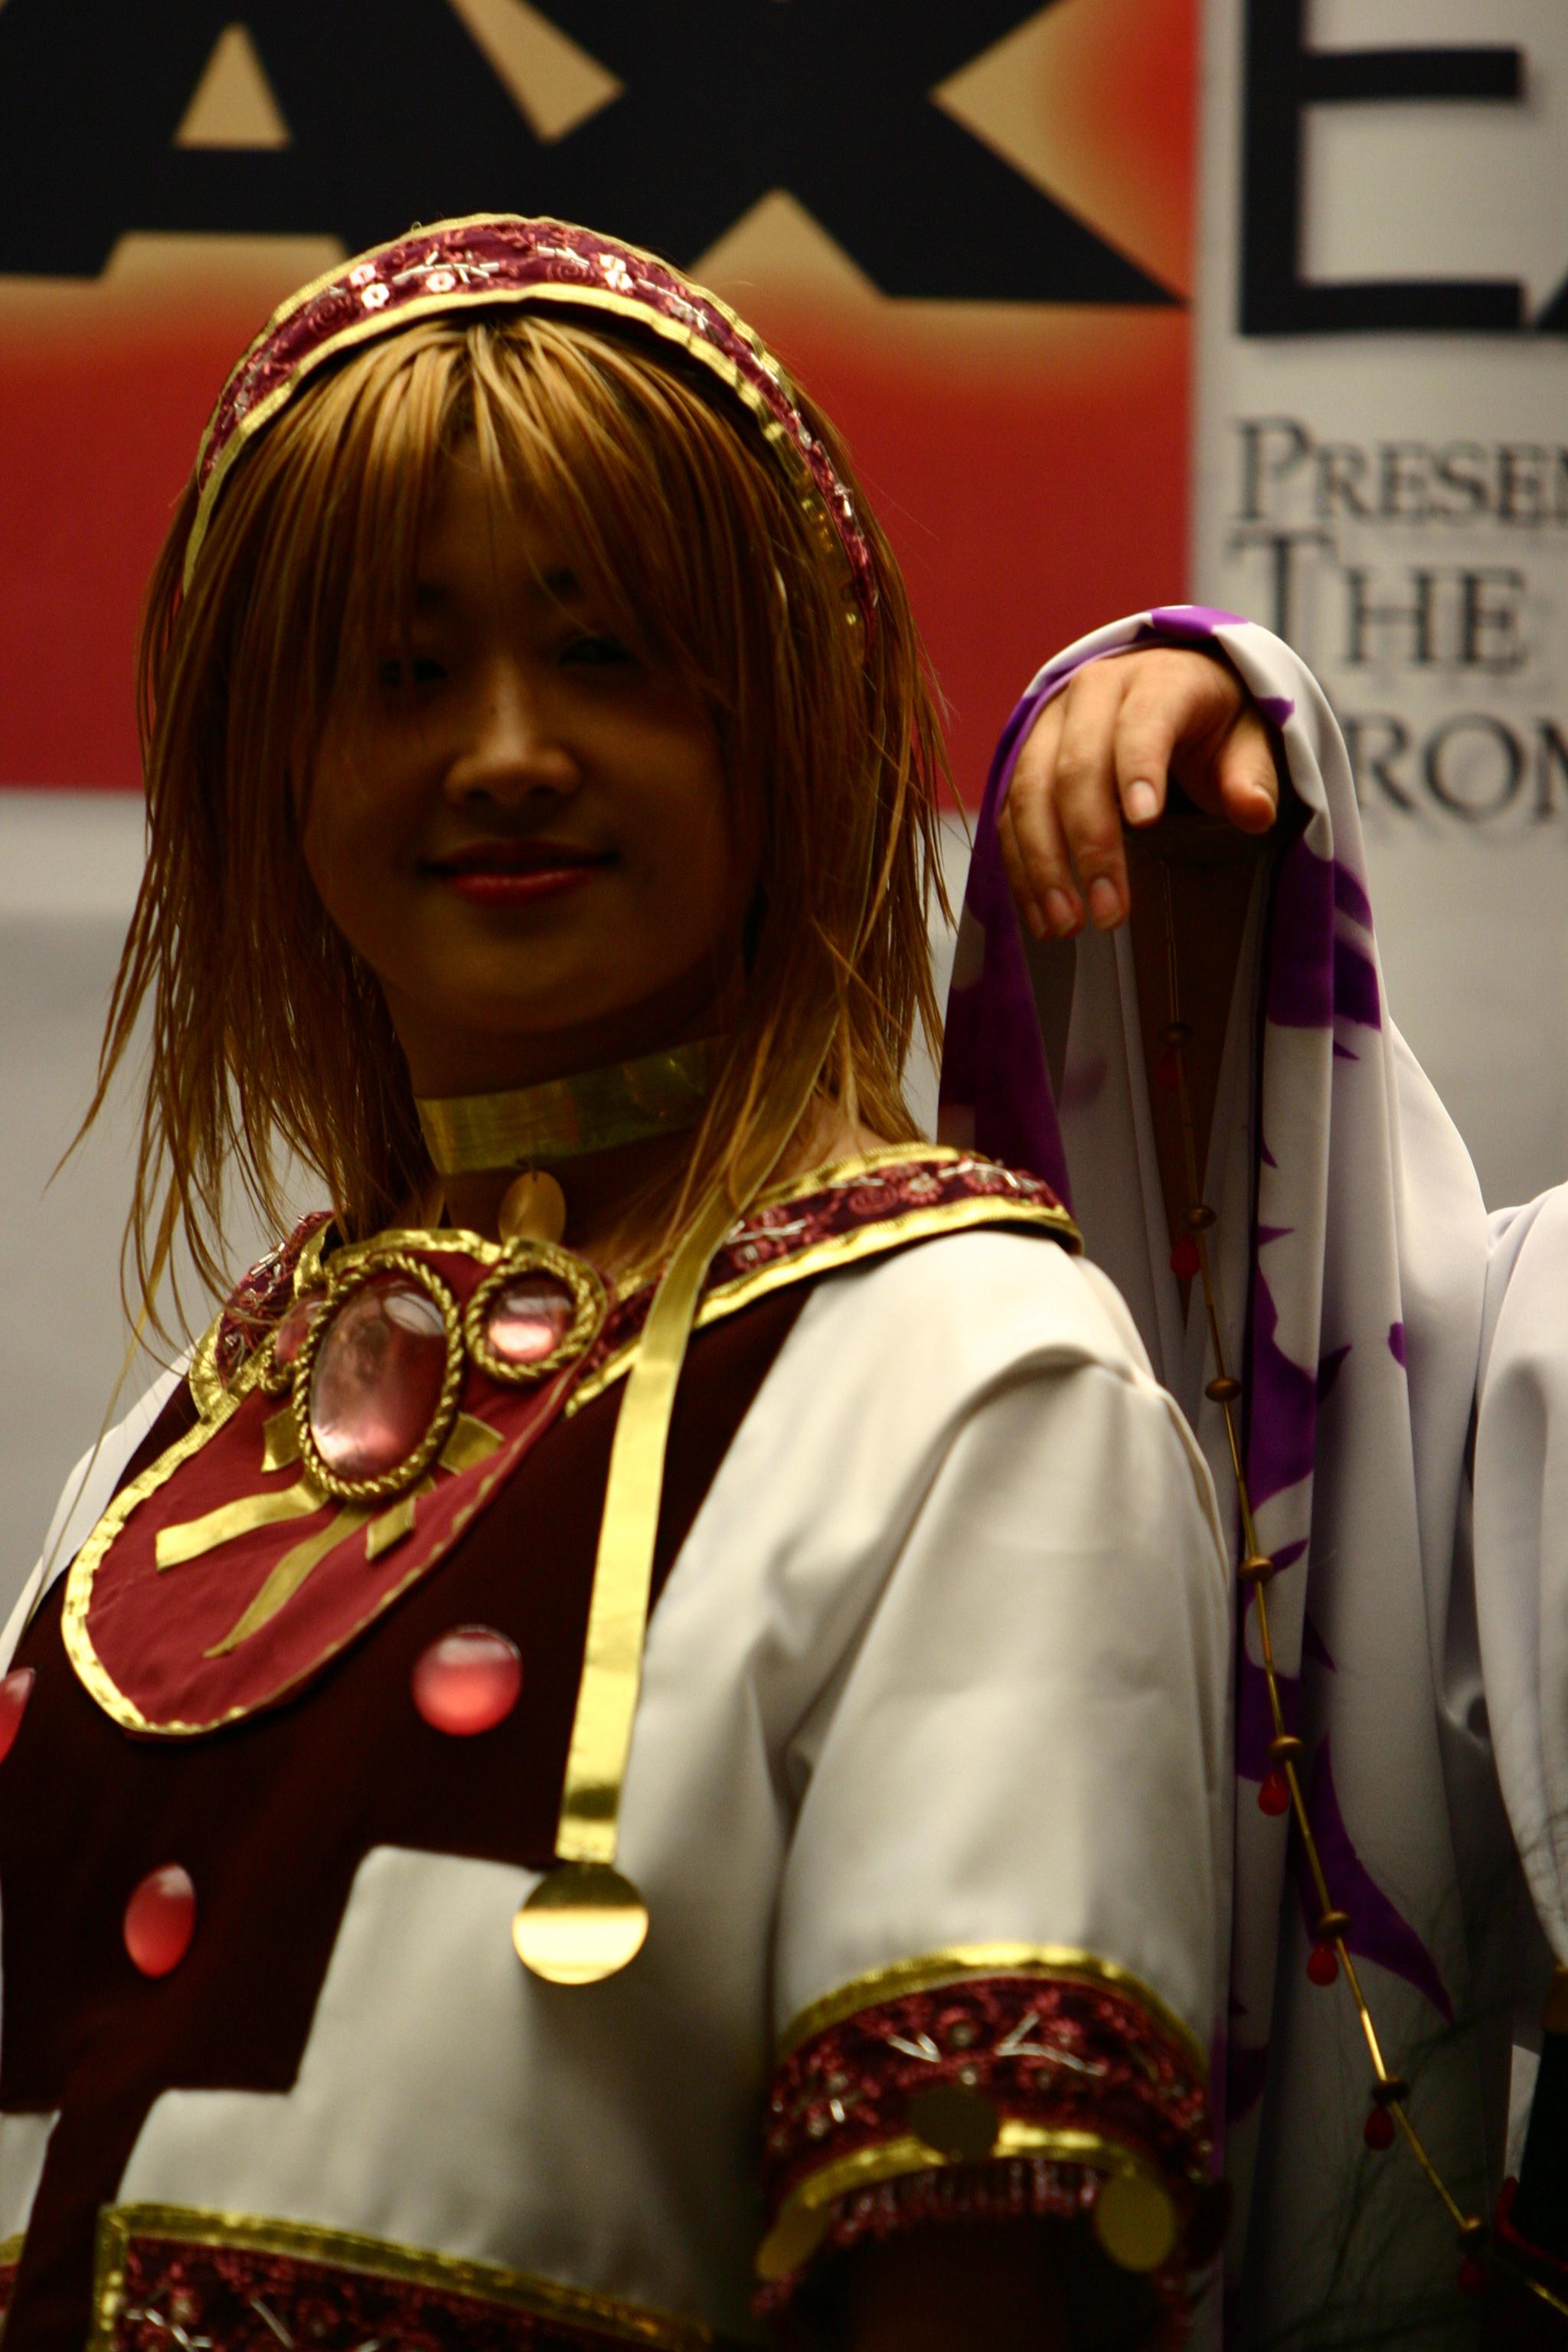 AX_2006_Masquerade_239.JPG